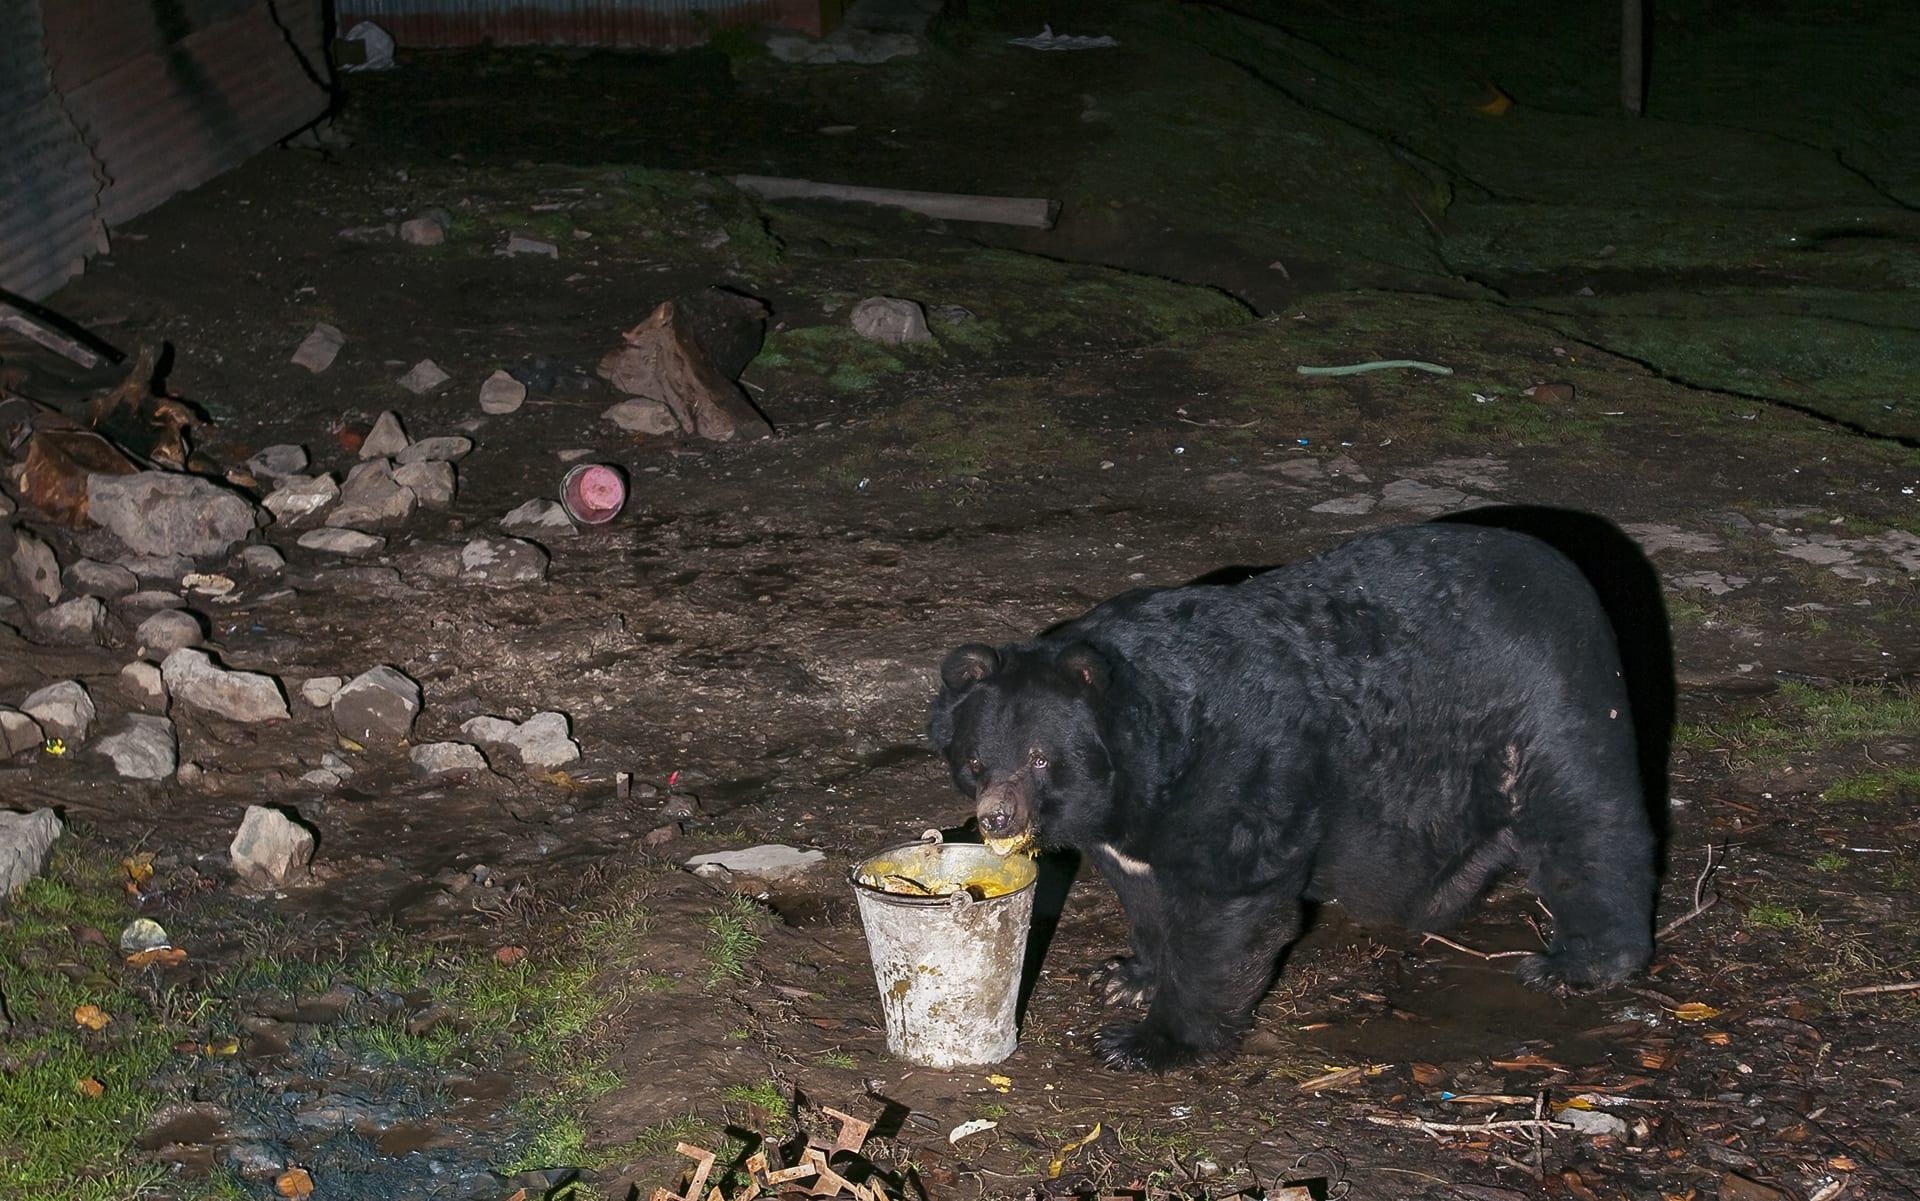 kashmir-gurez-valley-asiatic-or-himalayan-black-bear-at-army-canteen-eating-disposed-khichidi-human-interaction